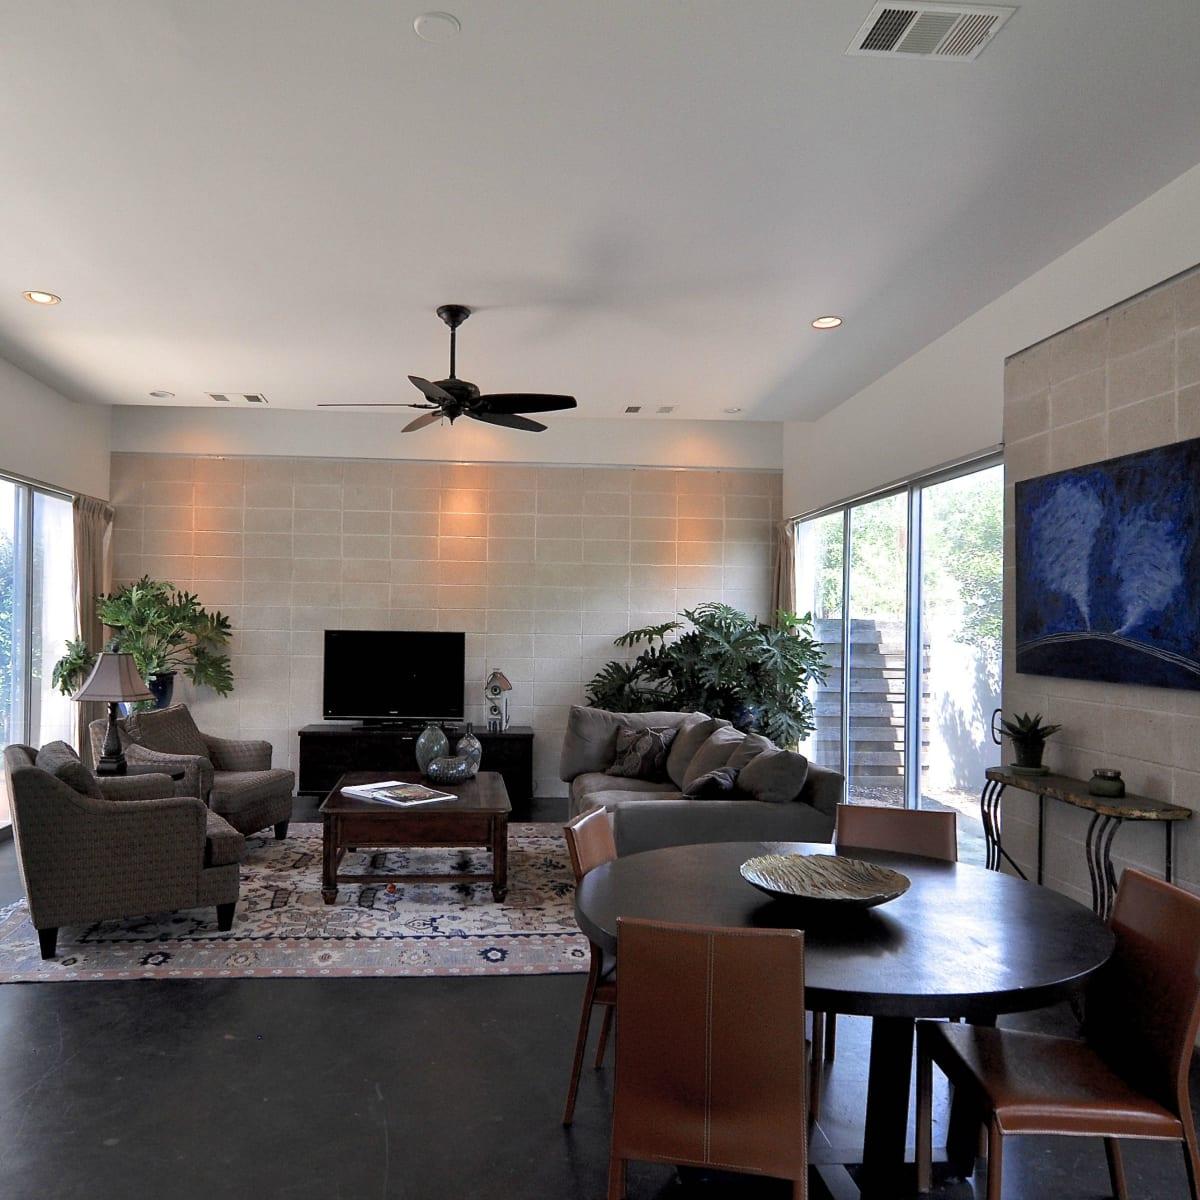 Austin home house 1011 E. 15th St. 78702 2015 living room